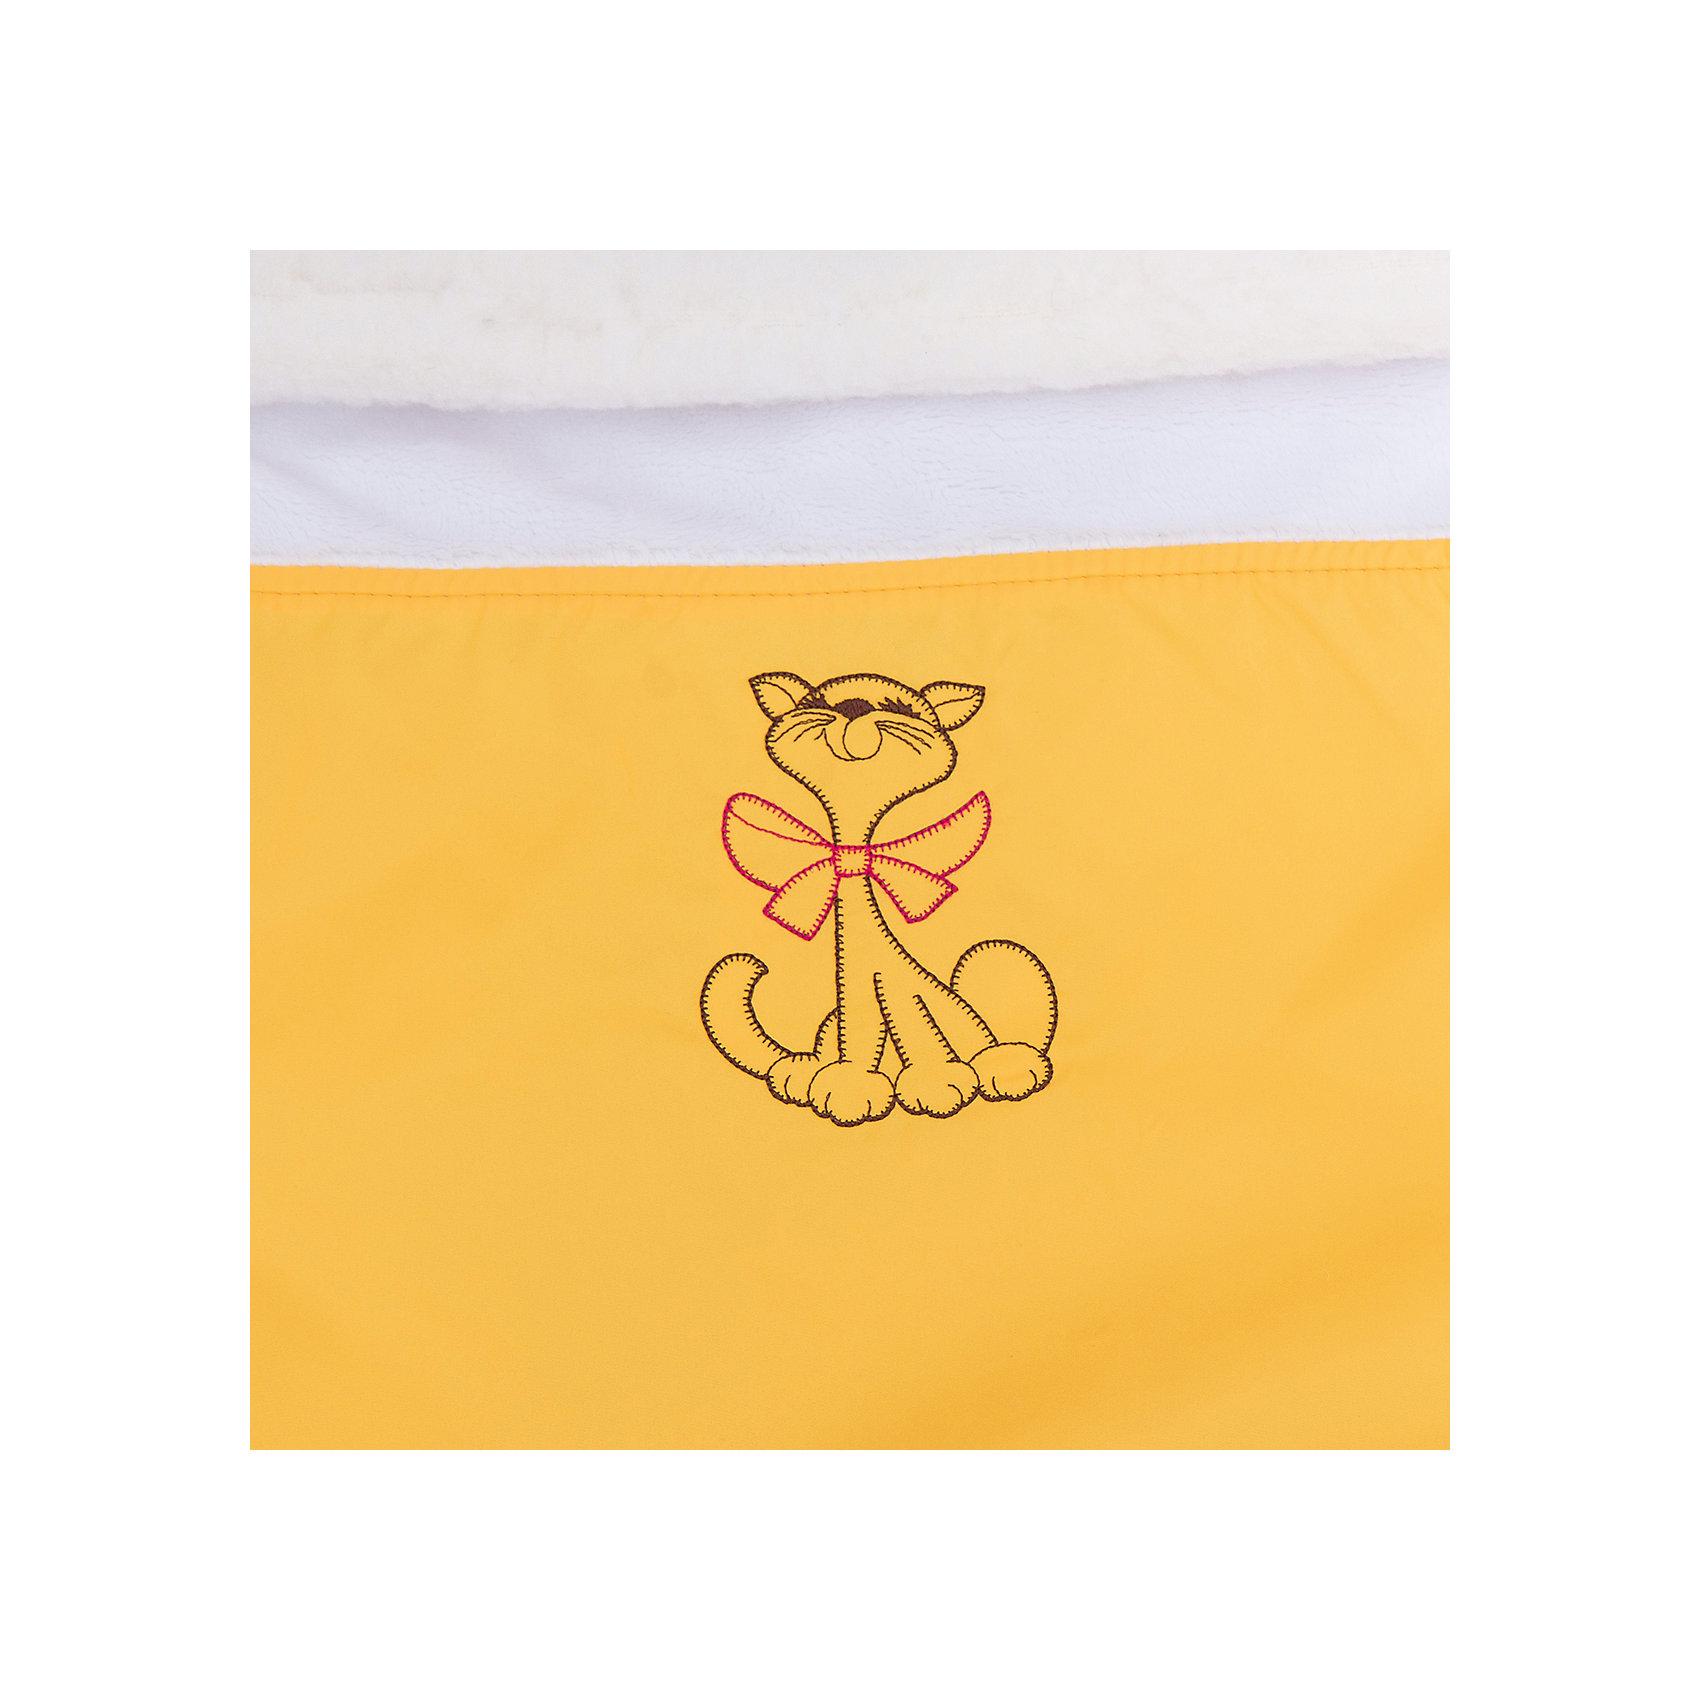 Меховой конверт Ладушка, Топотушки, жёлтый